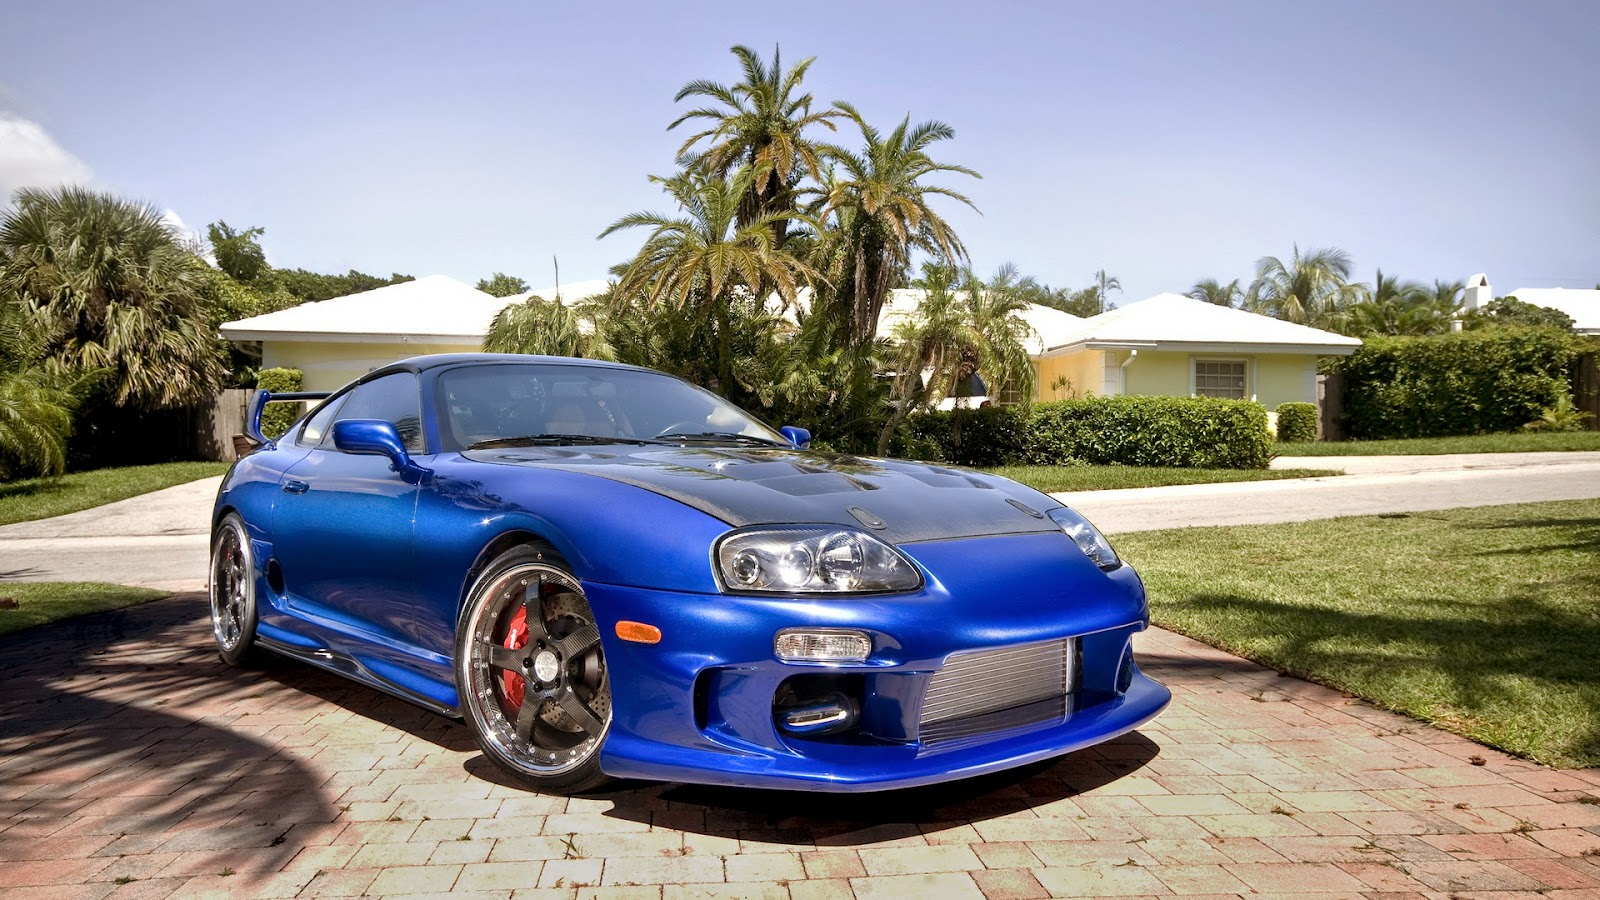 Toyota Supra Blue Custom Wallpaper Free Hd Wallpaper And